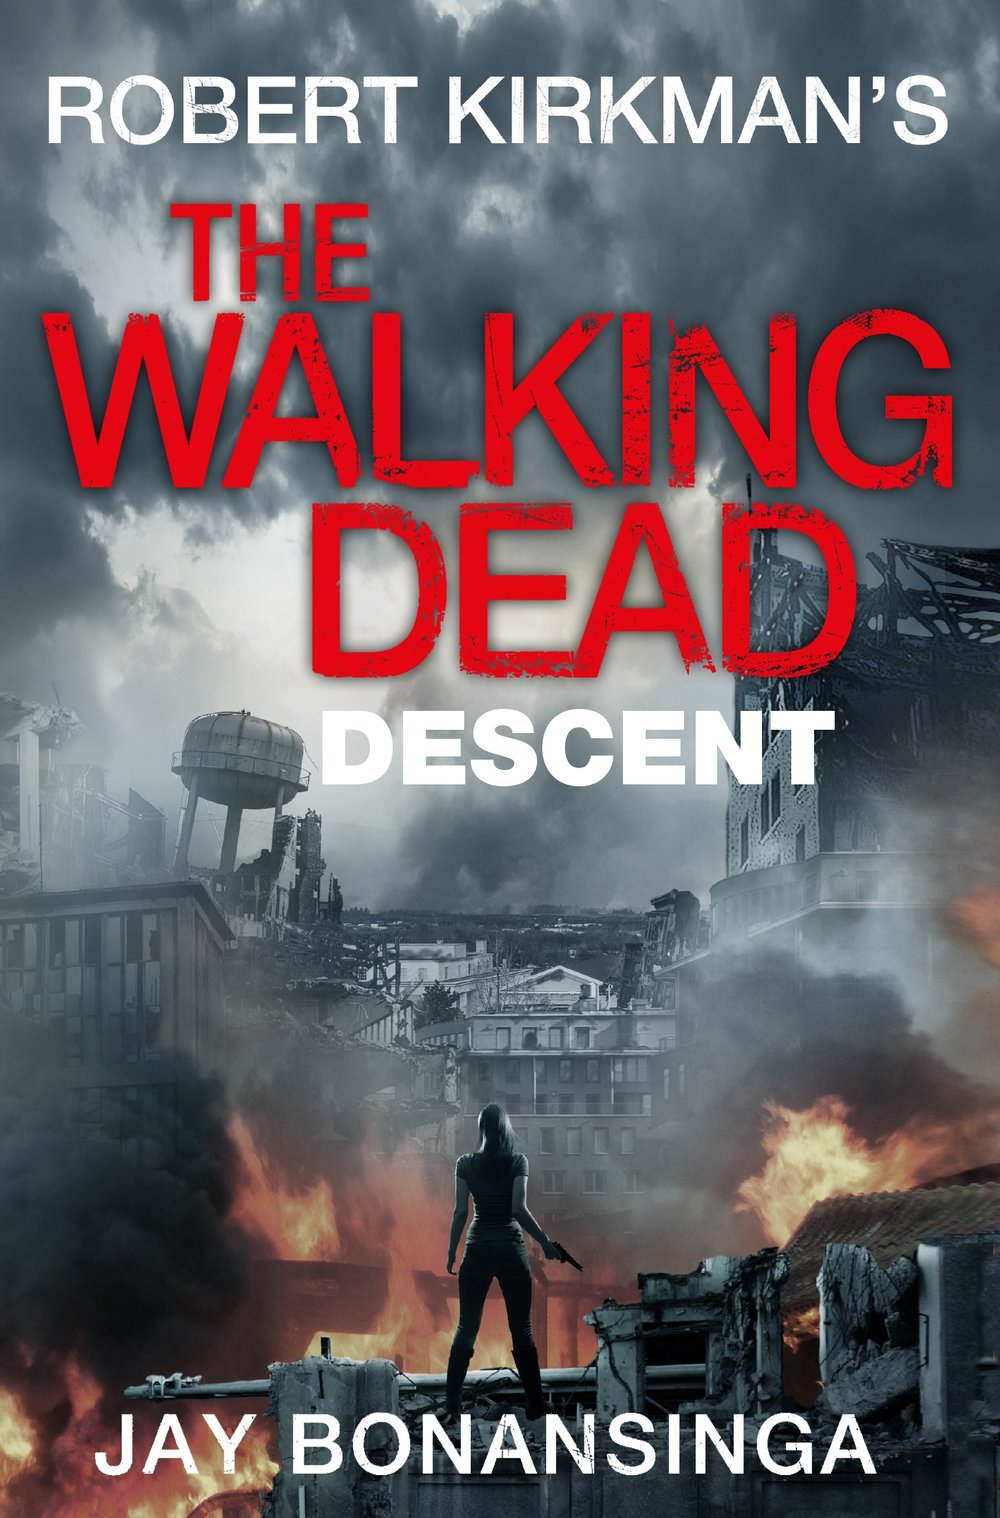 9781447275749The Walking Dead Descent.jpg